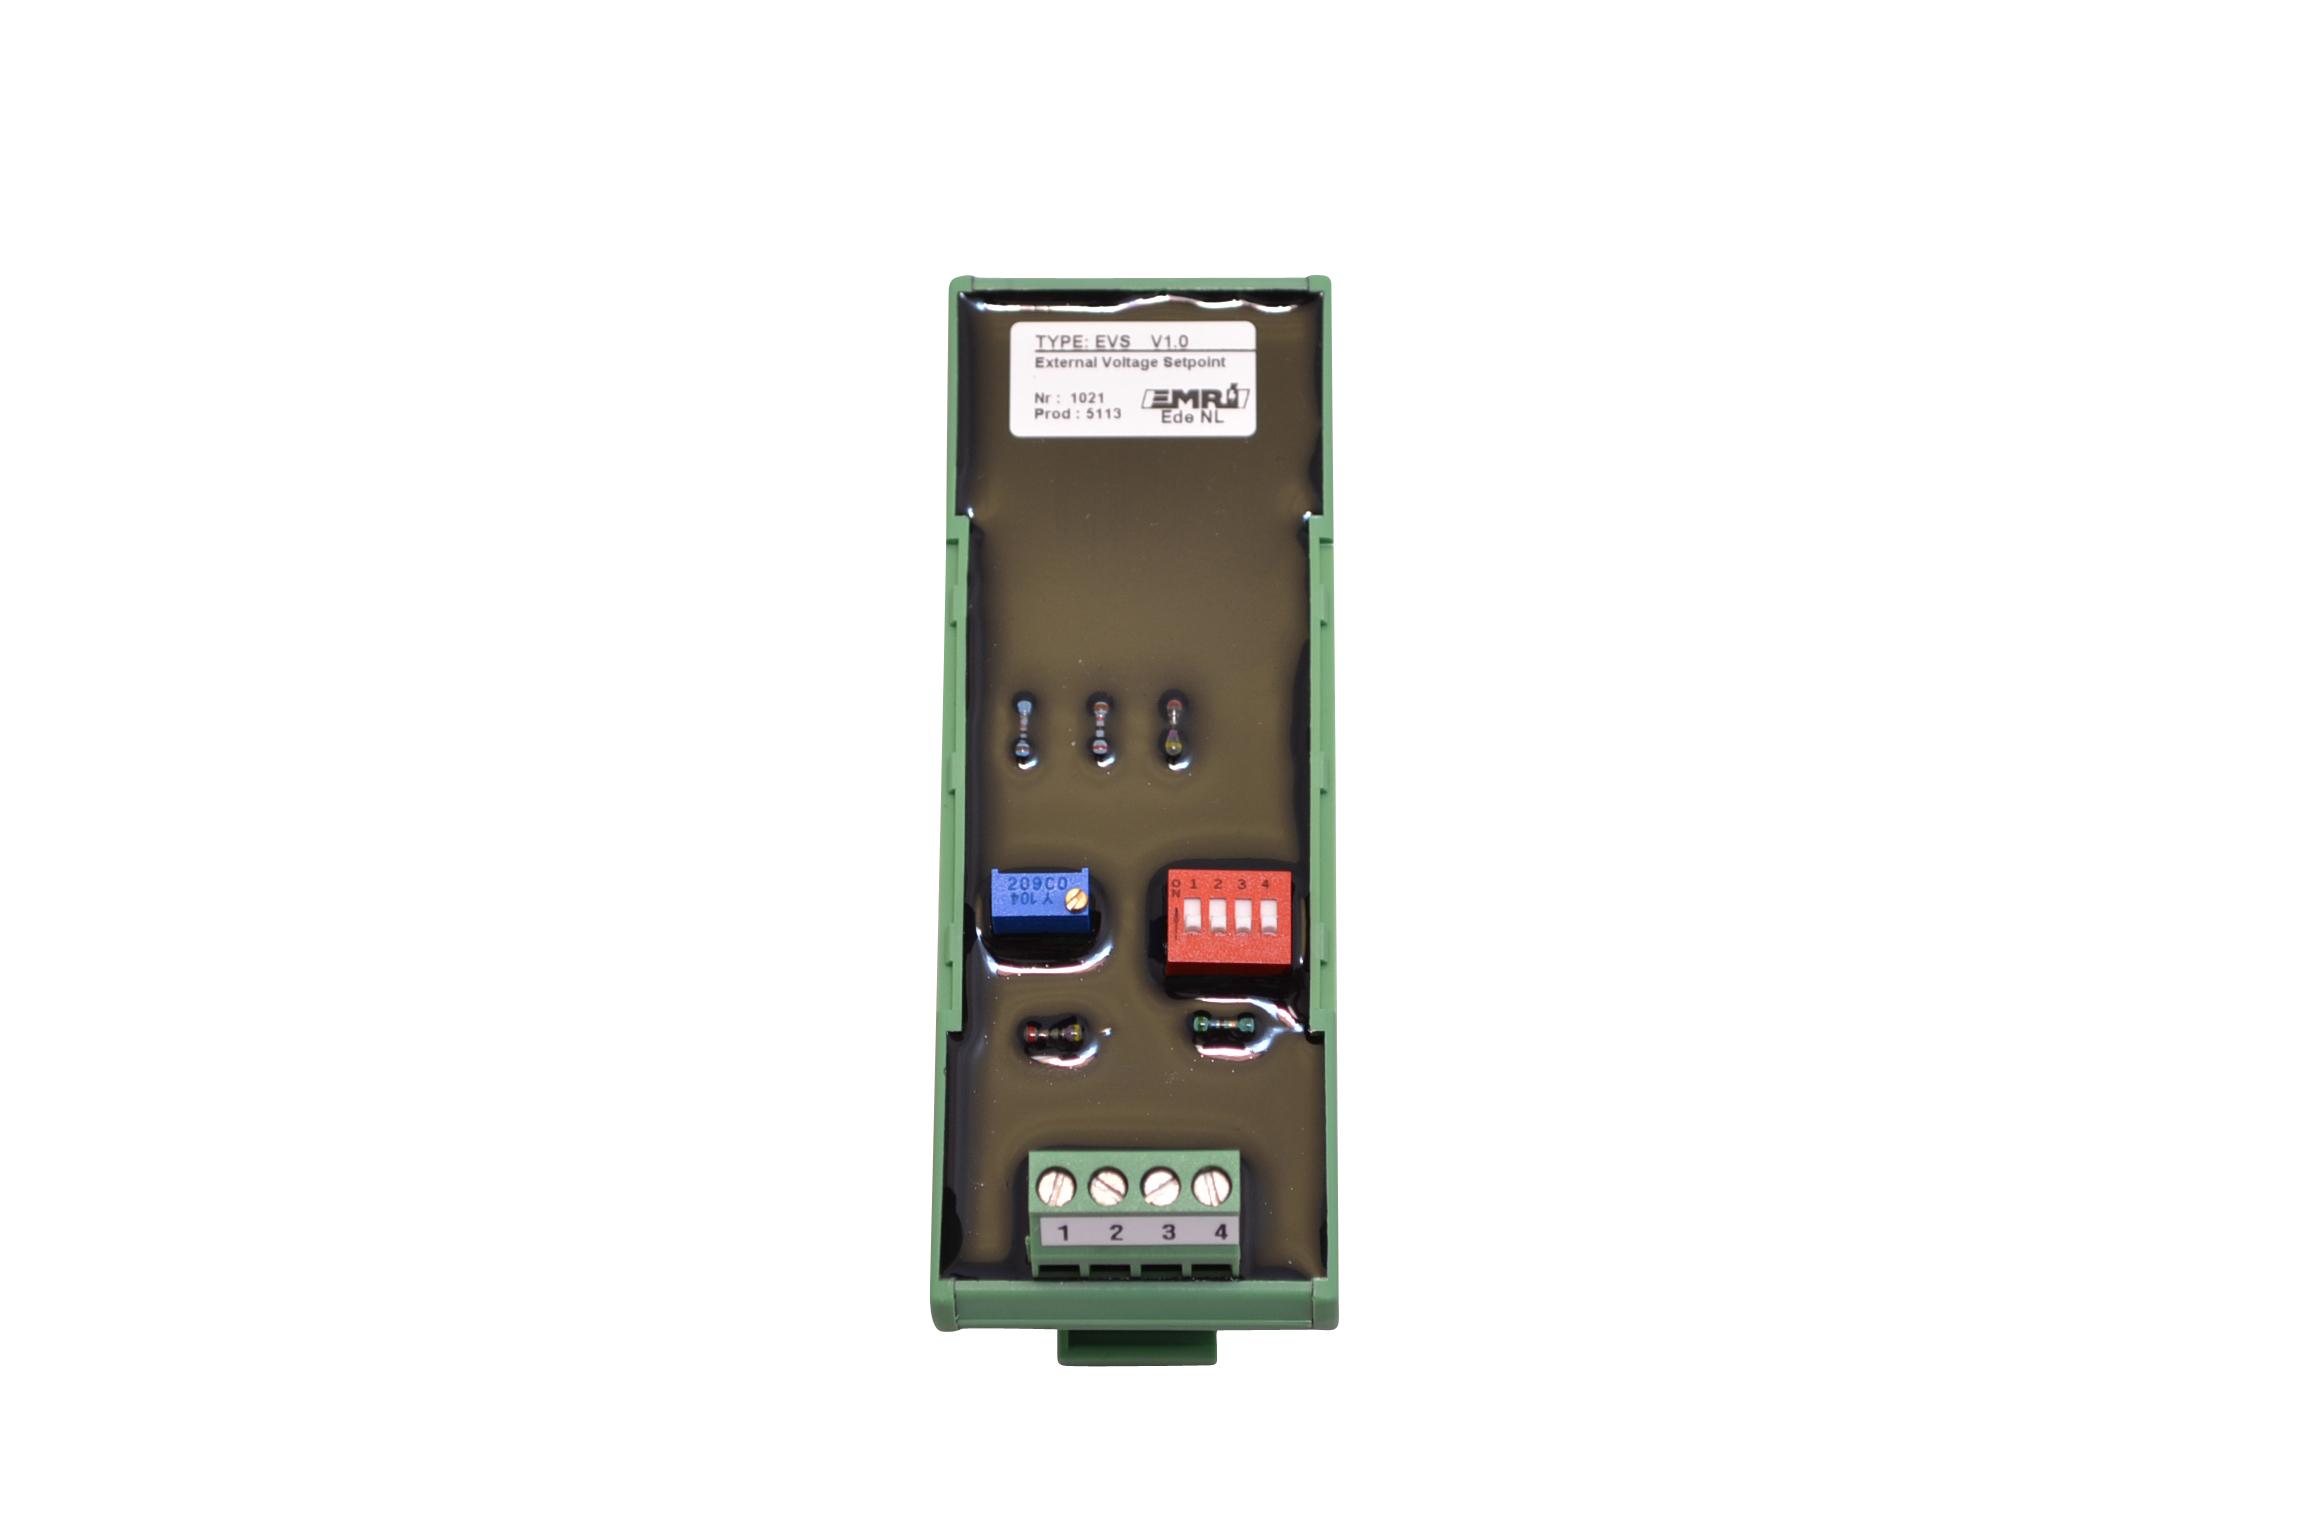 external accesoires voltage setpoint input setpoint accessoires emri Honda Generator Manual Electric Generators Manual